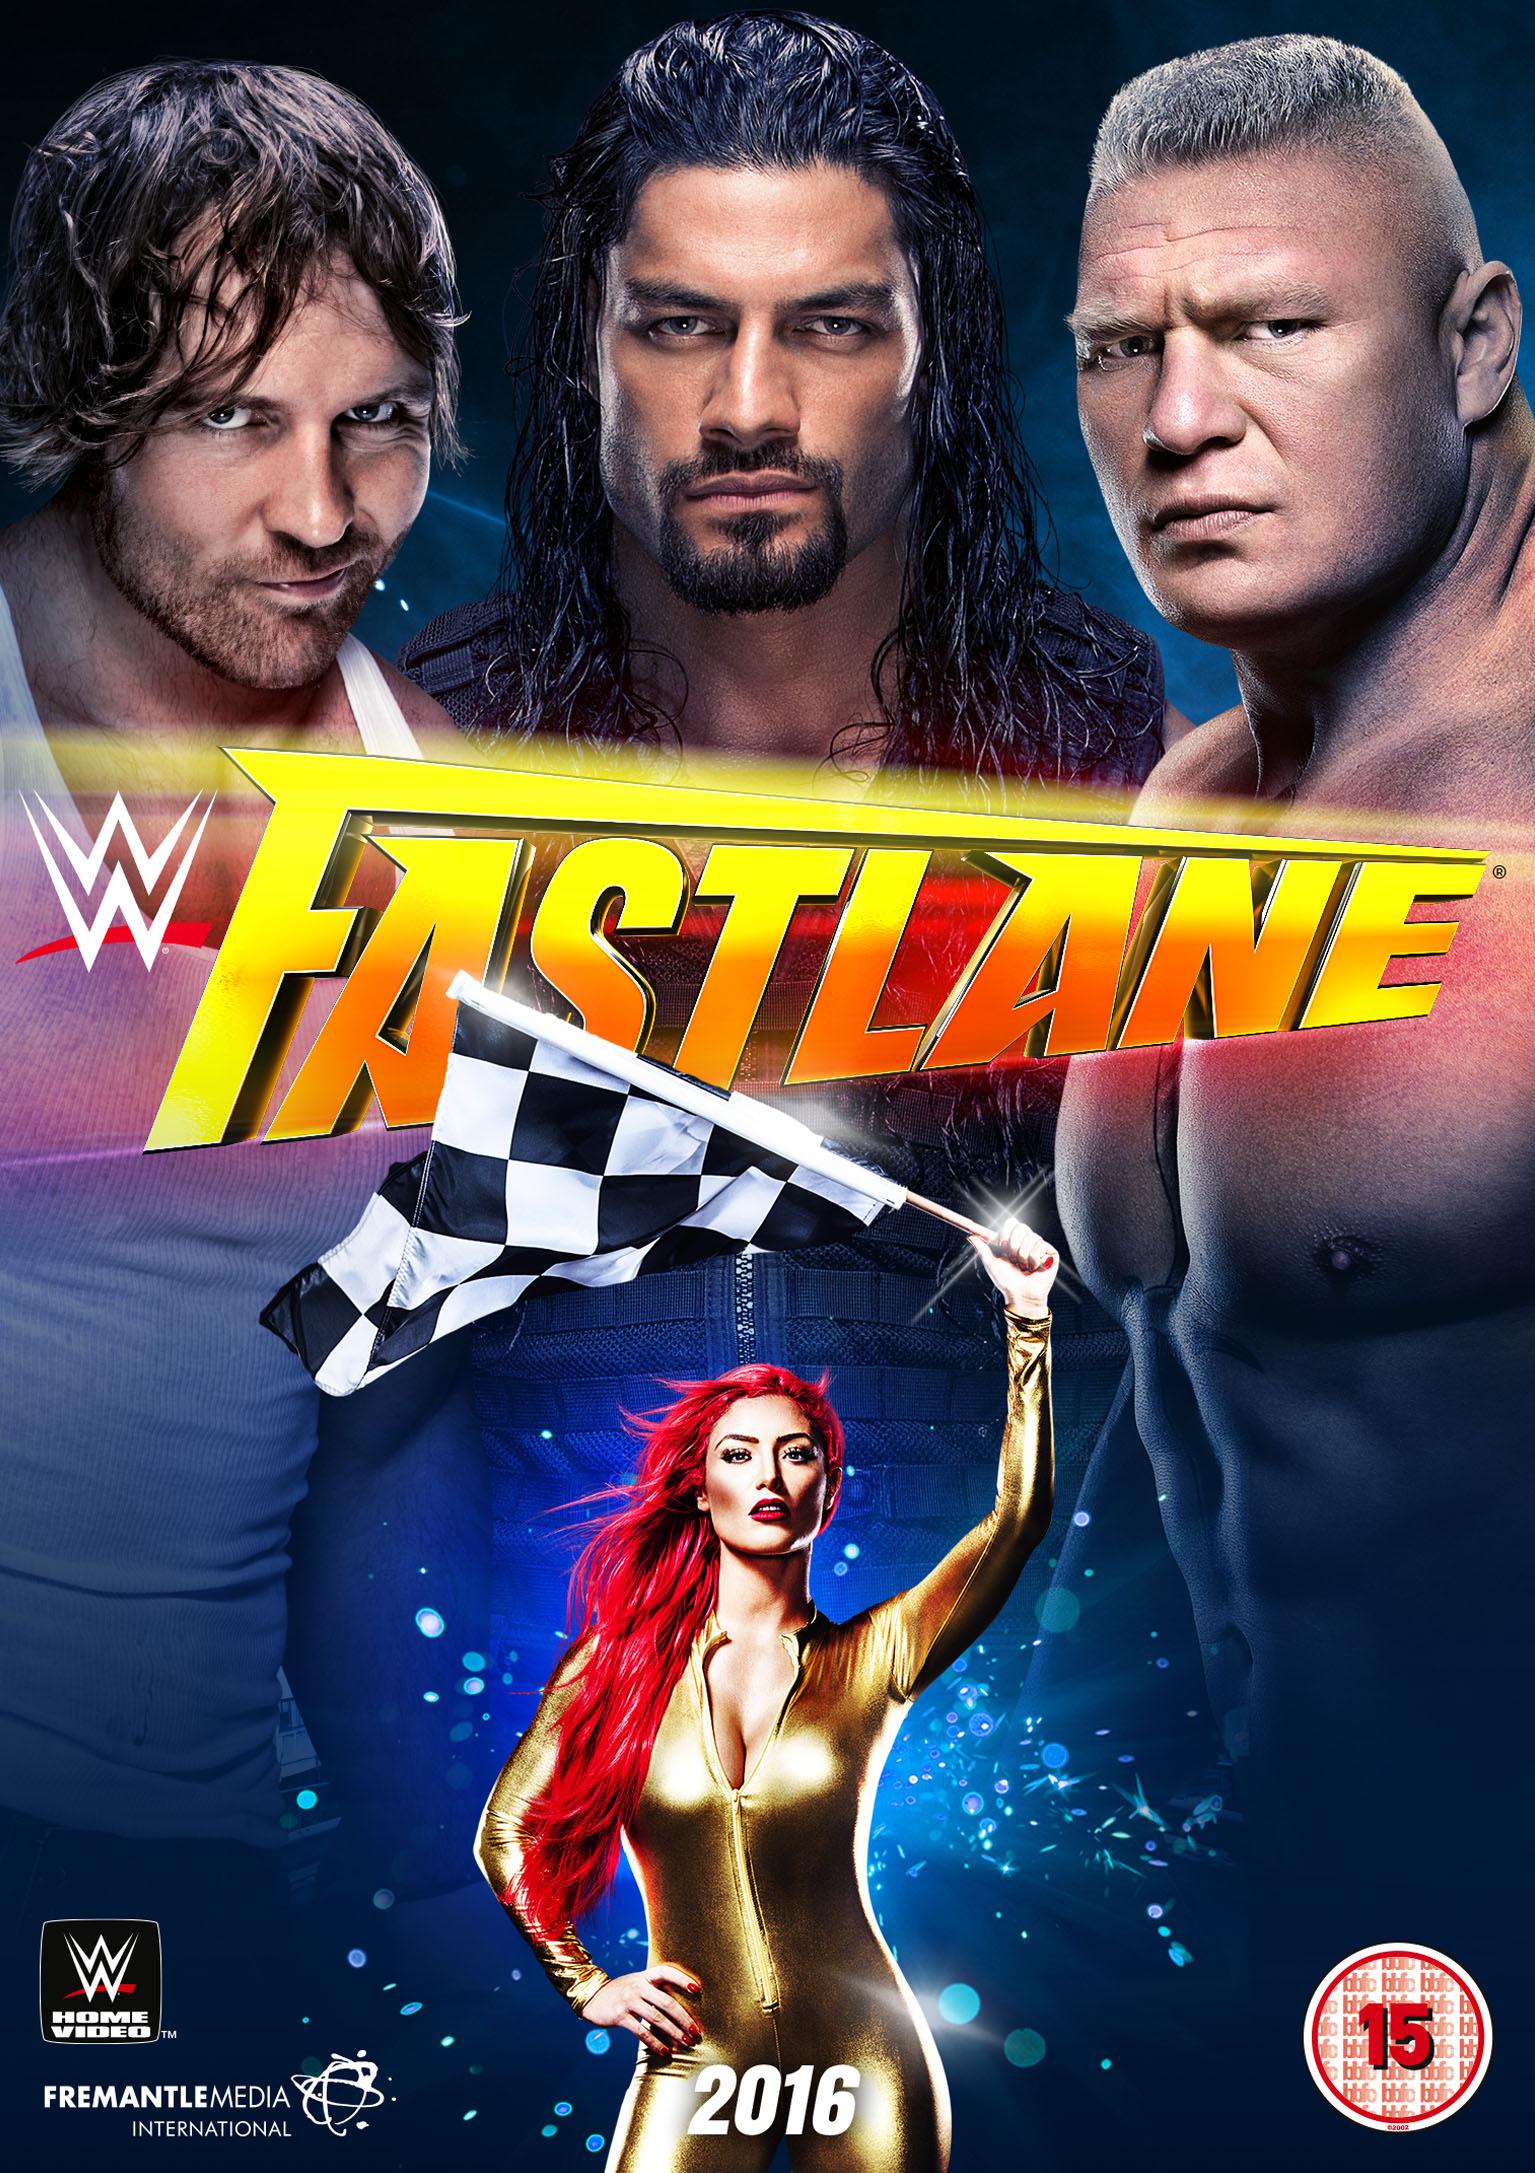 WWE: FASTLANE 2016 - Fetch Publicity